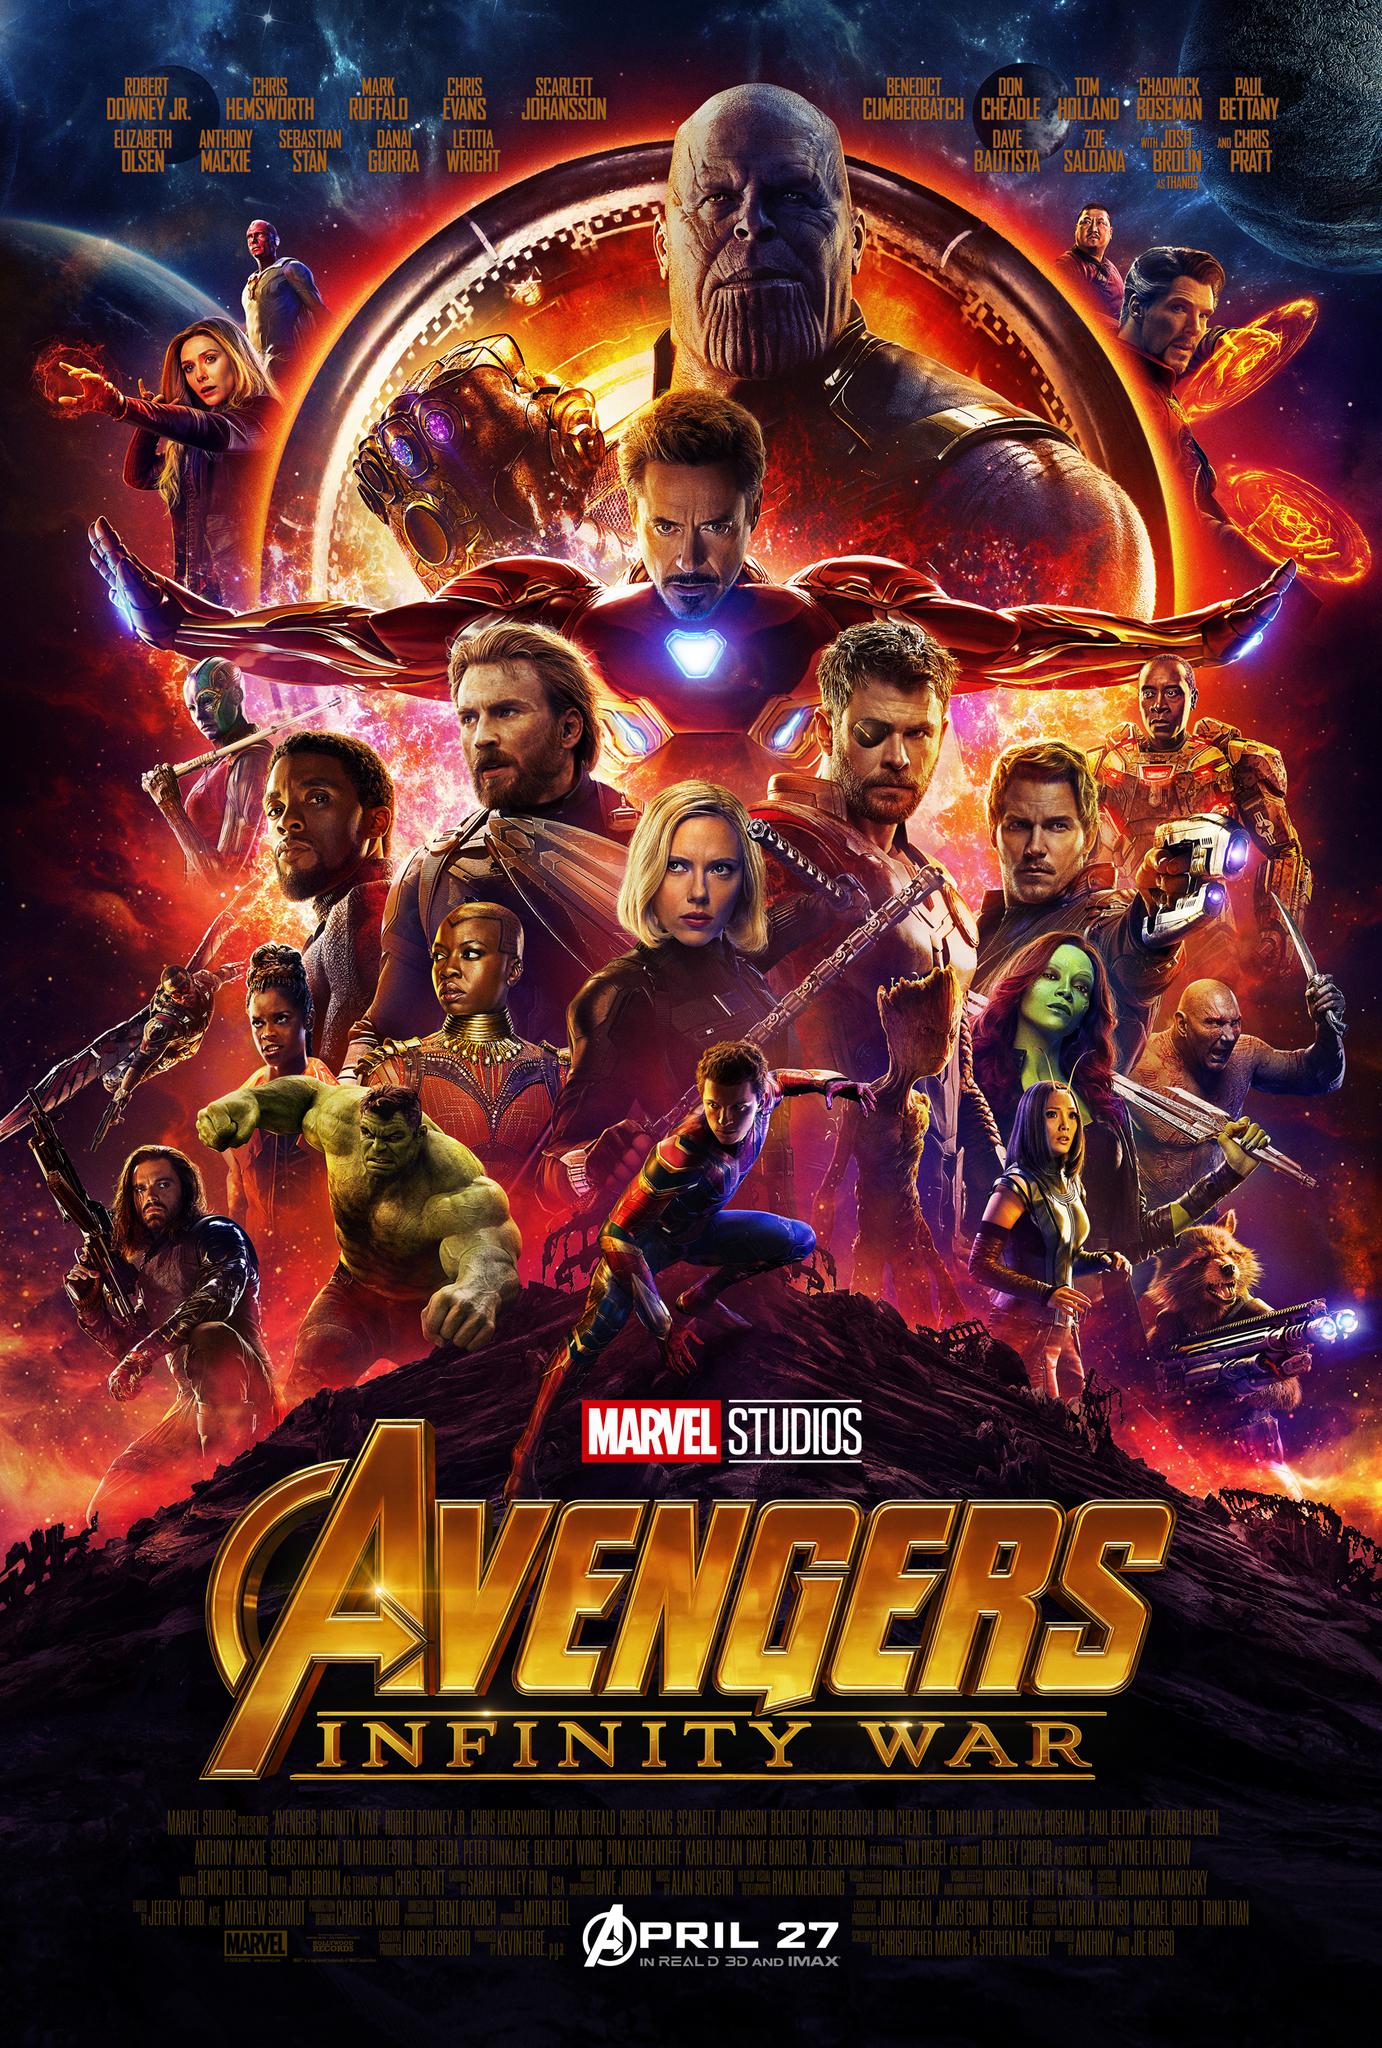 Avengers: Infinity War - Legacy Effects Crew